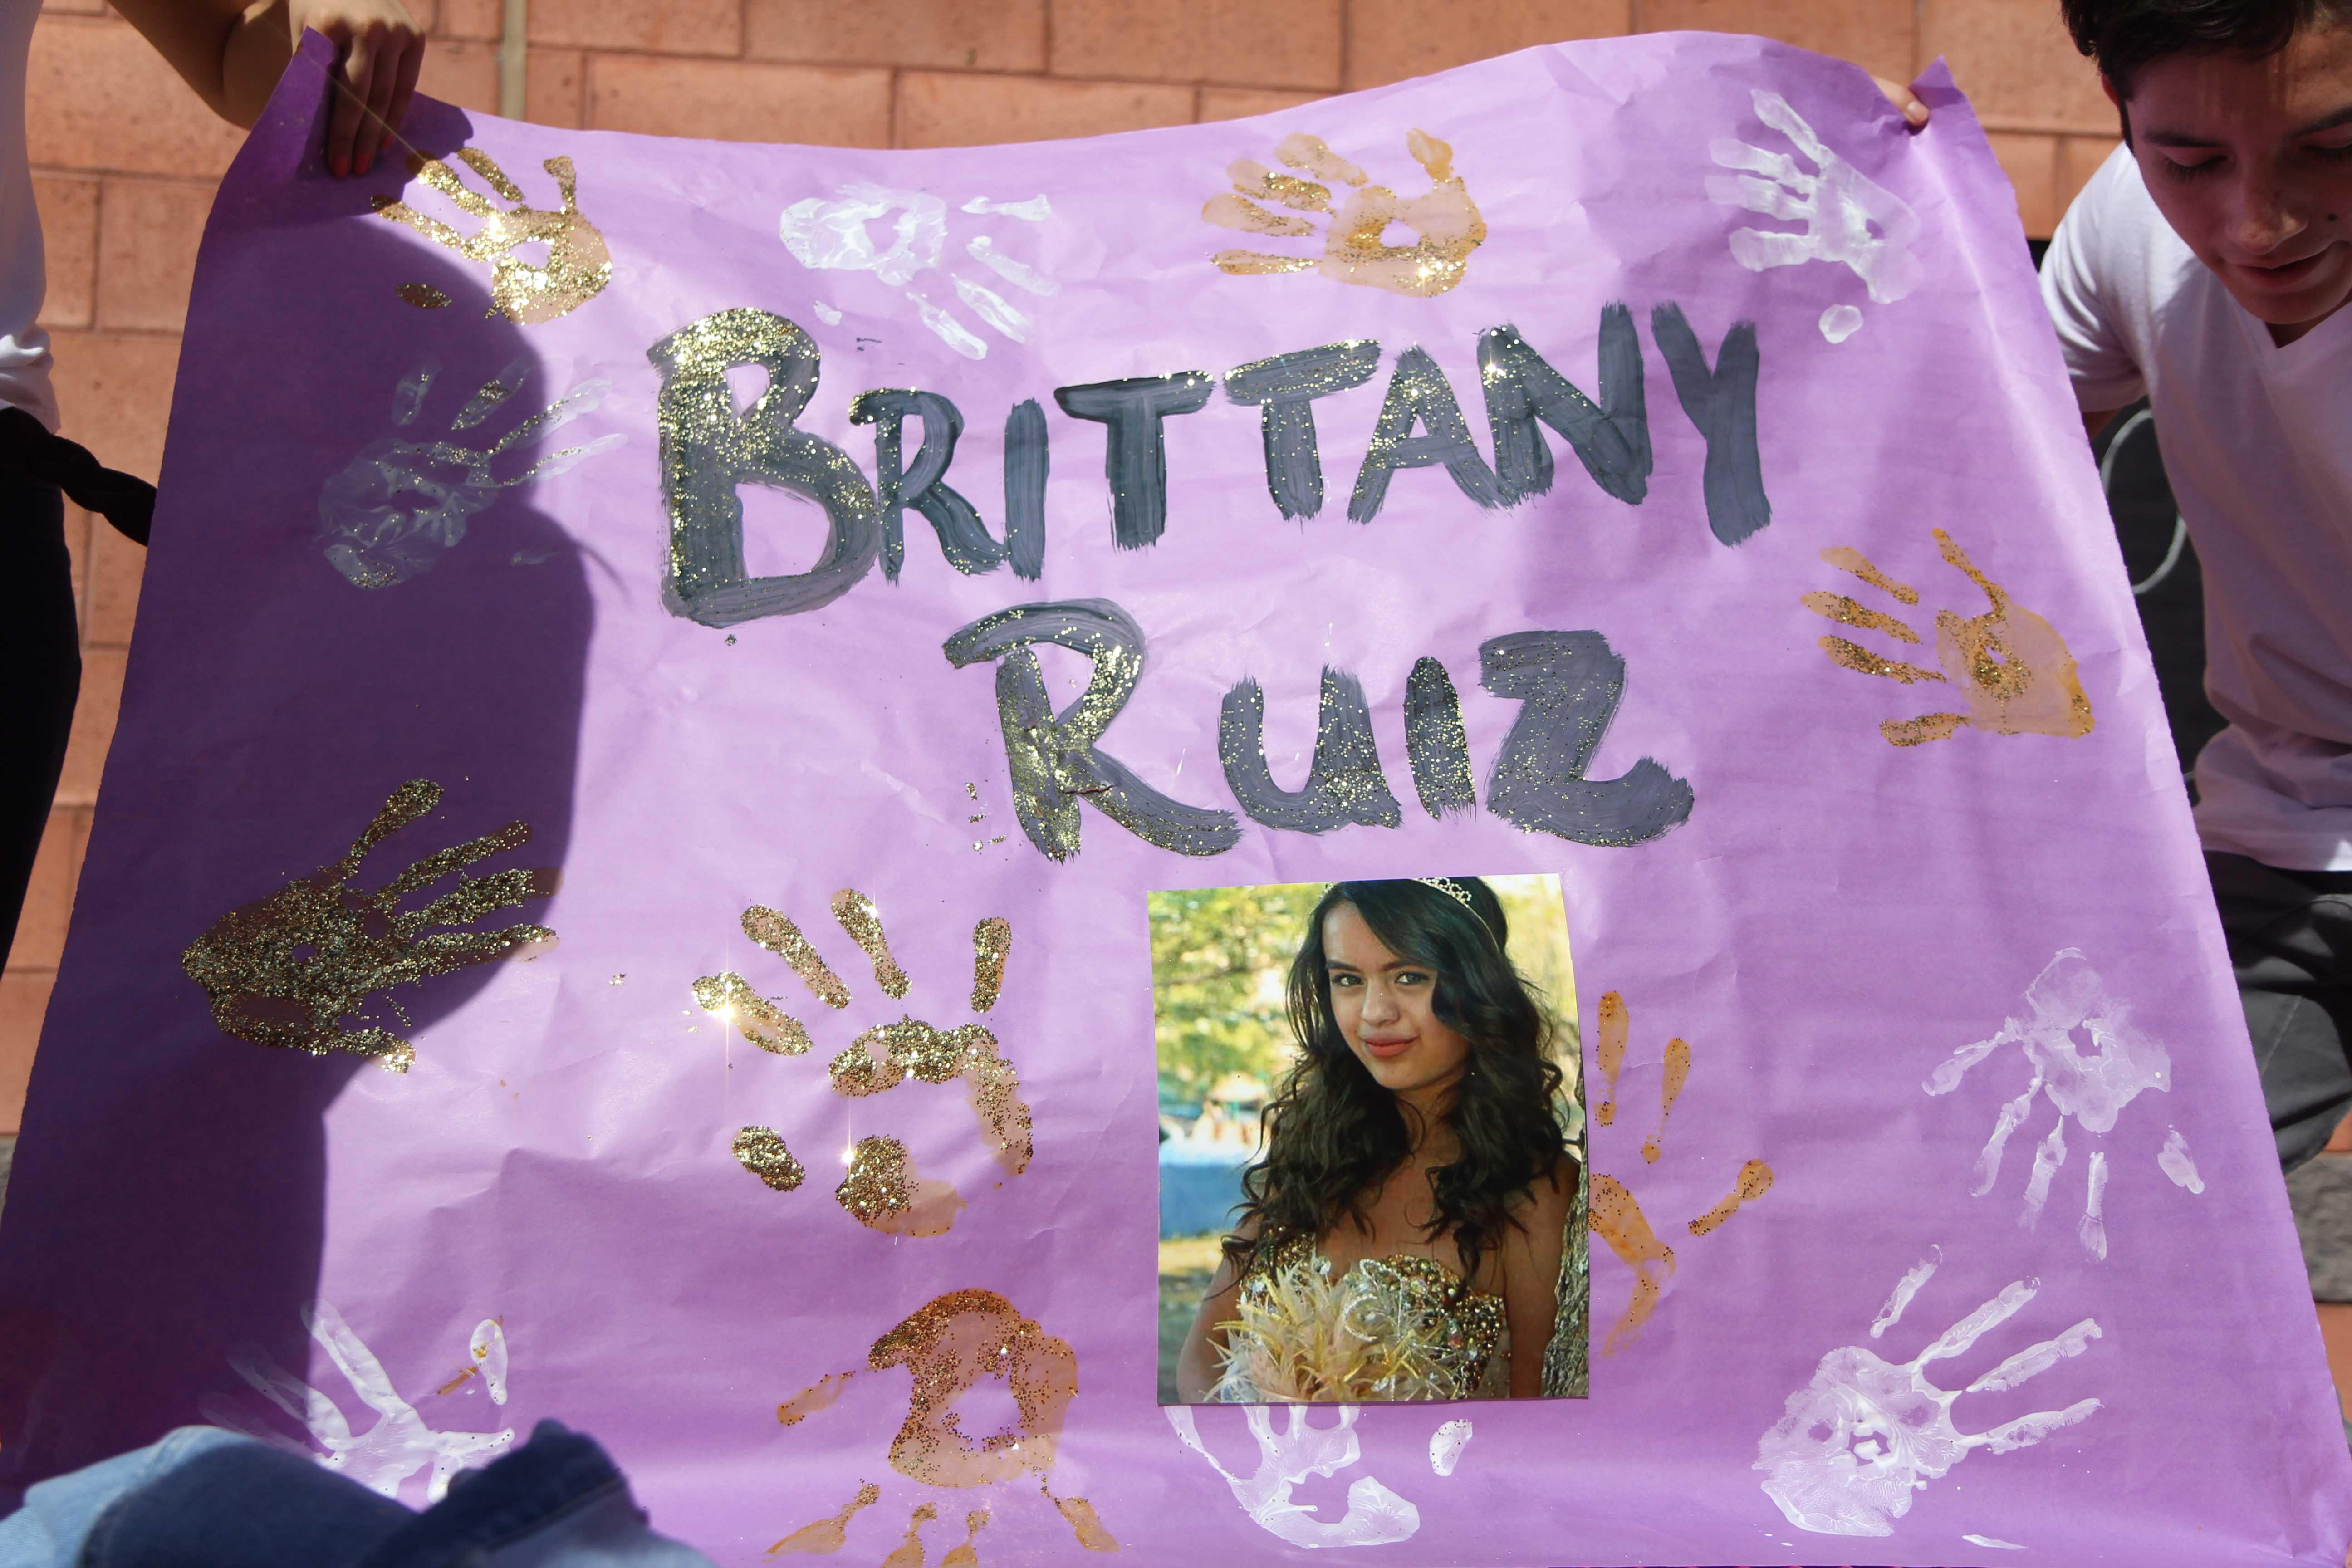 Brittany Ruiz Memorial